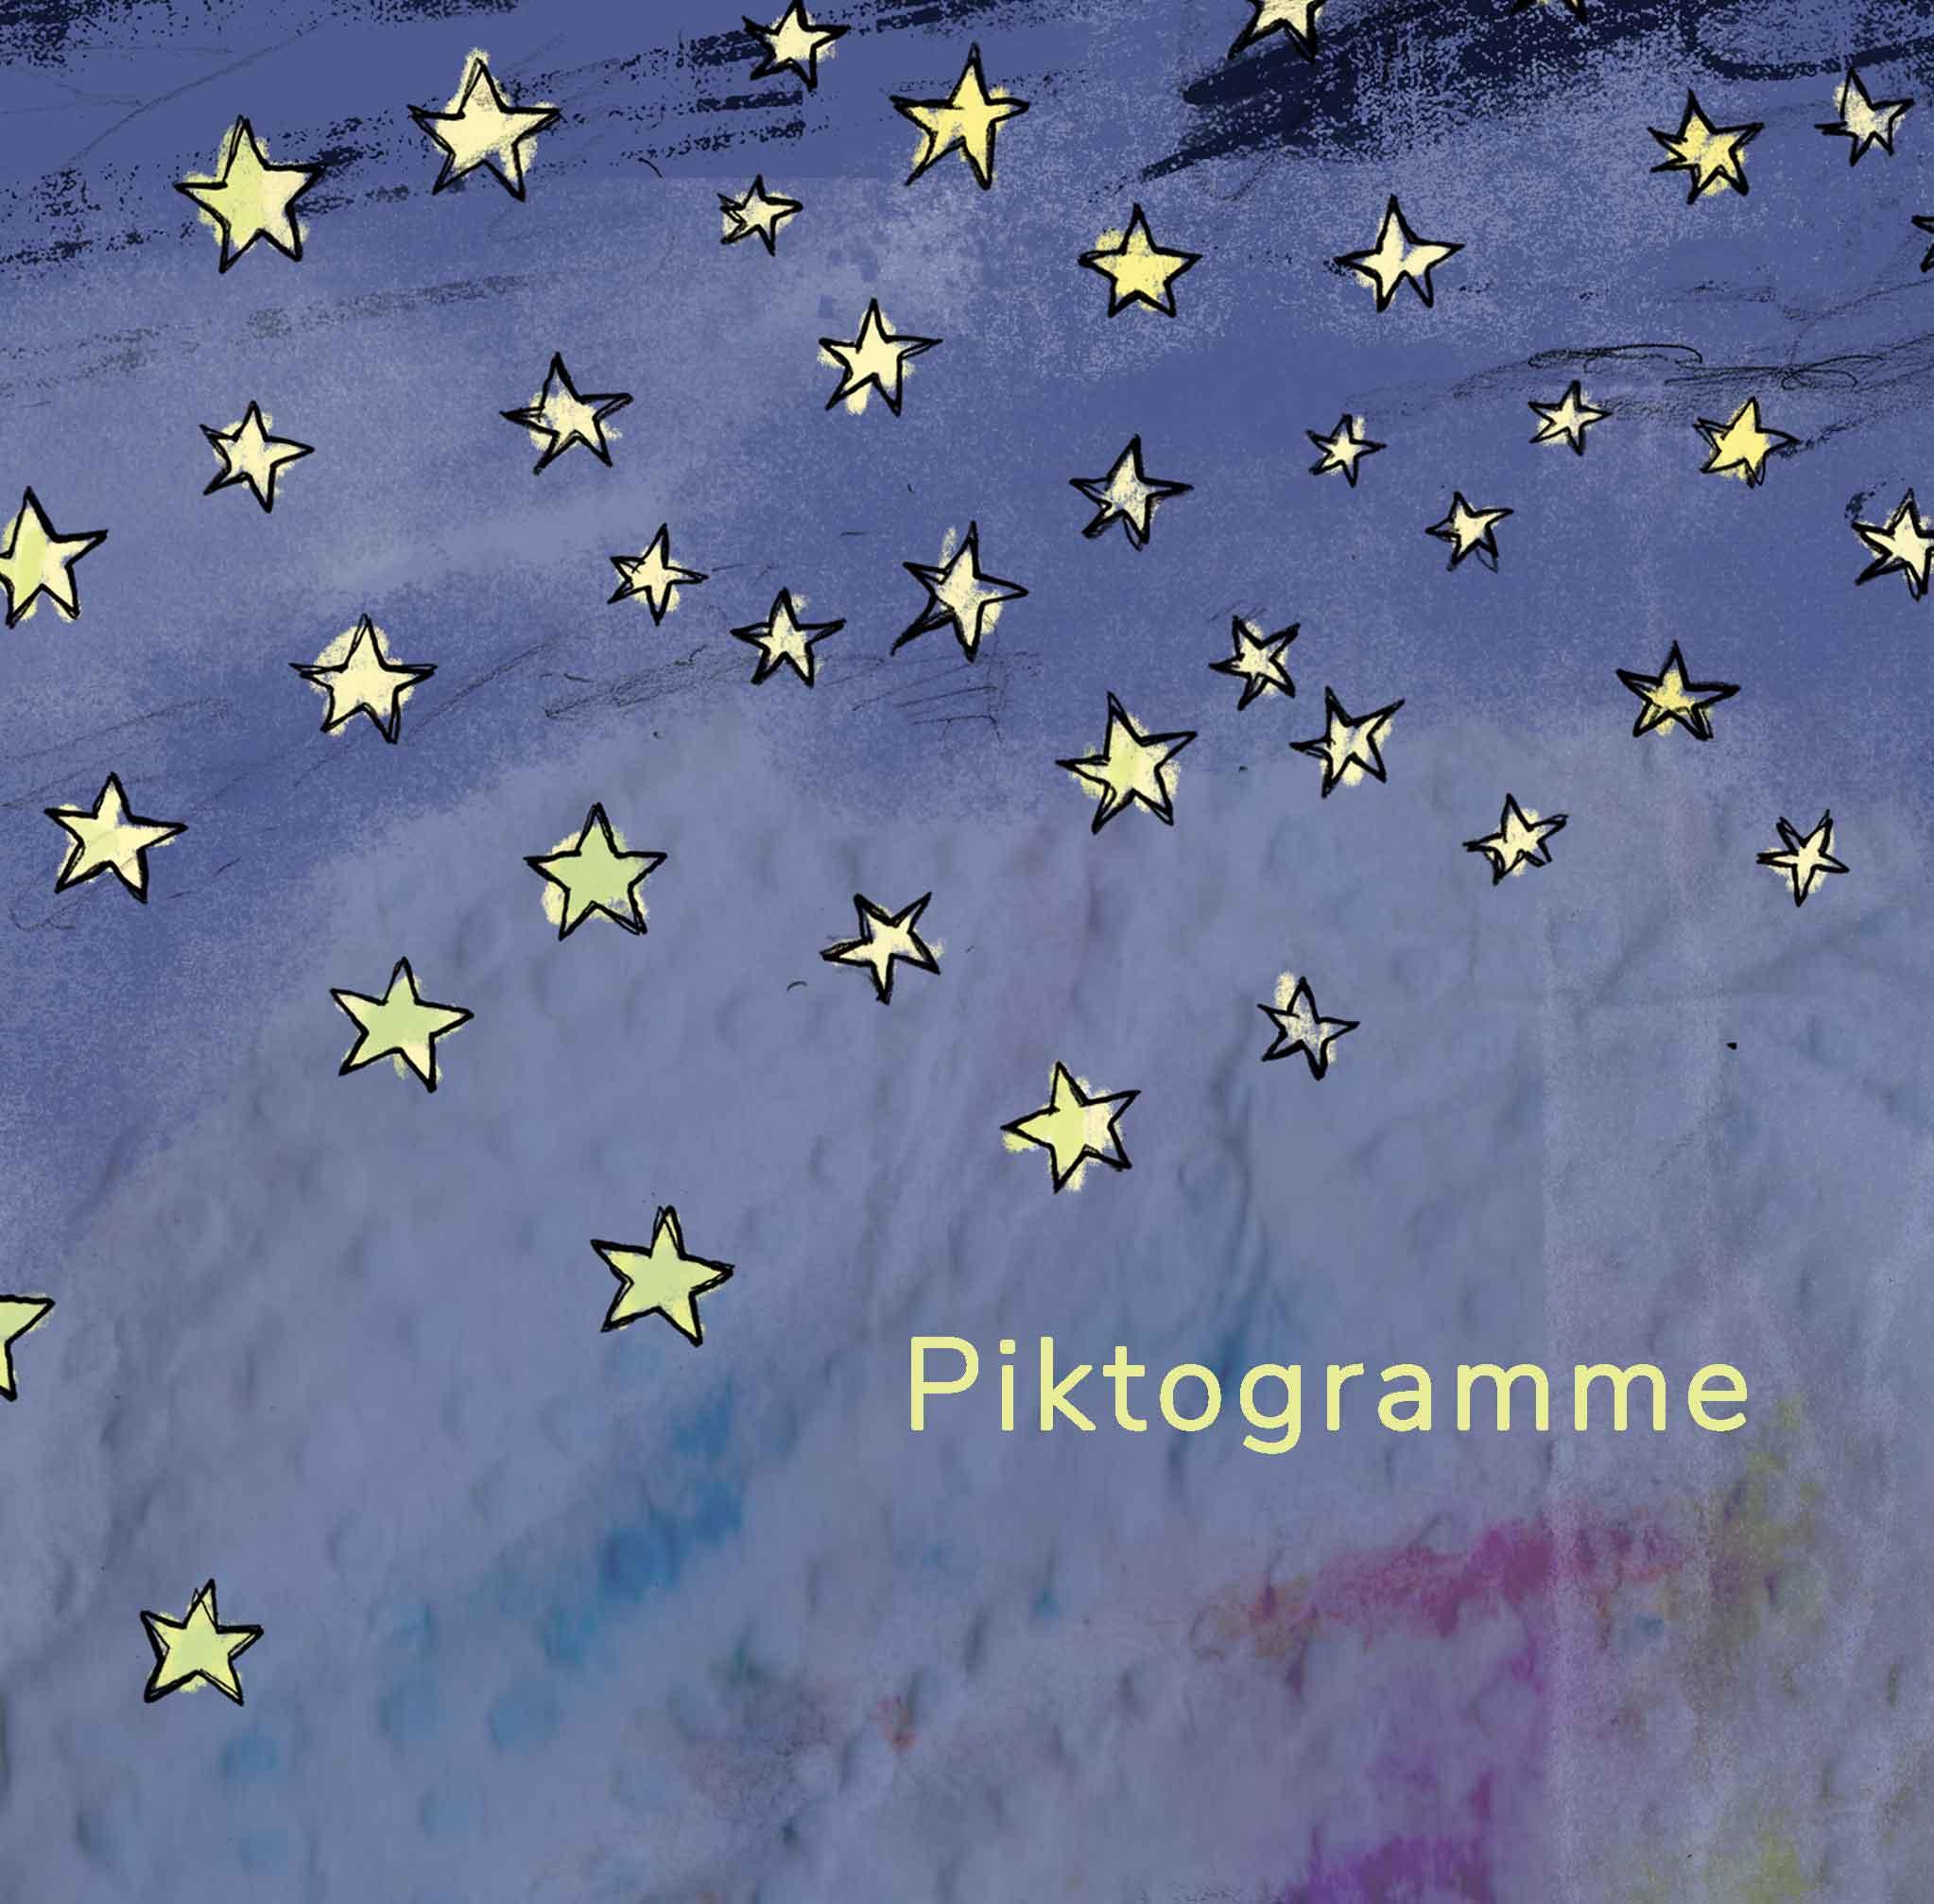 pikrogramme